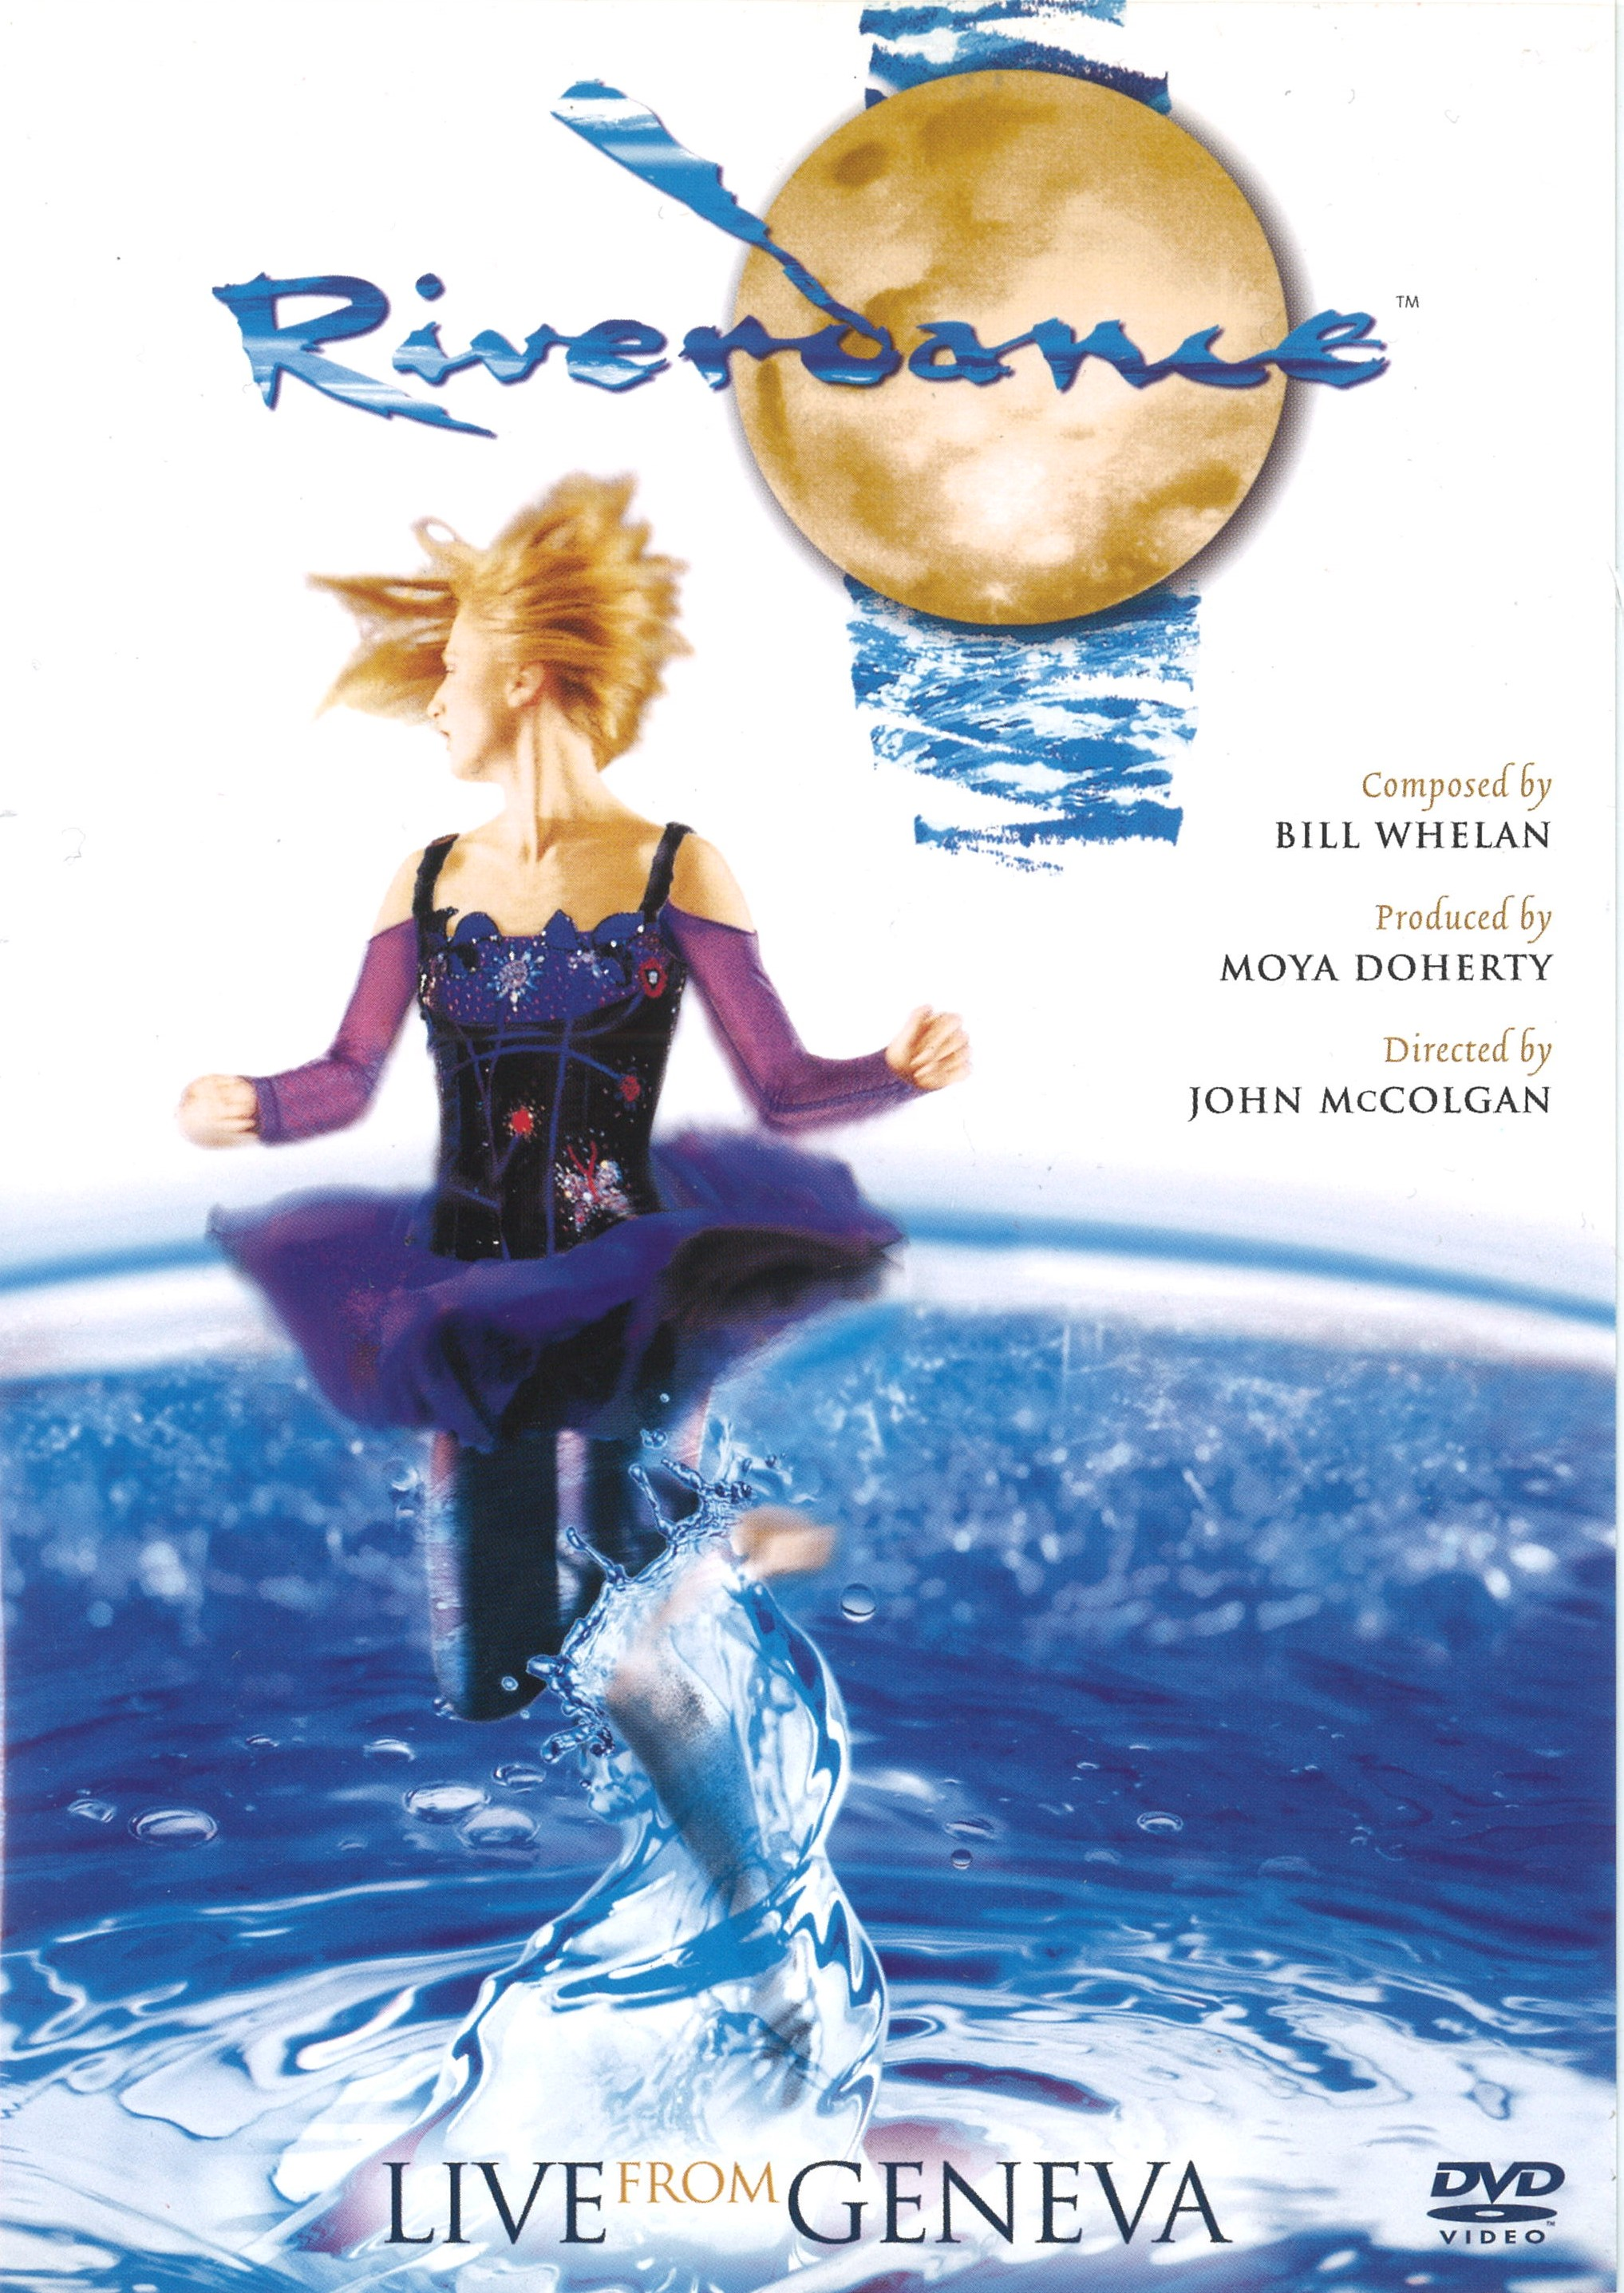 【OpusArte&BelAirフェア】River dance LIVE from GENEVA〈リバーダンス ライヴ・フロム・ジュネーヴ〉(直輸入DVD)